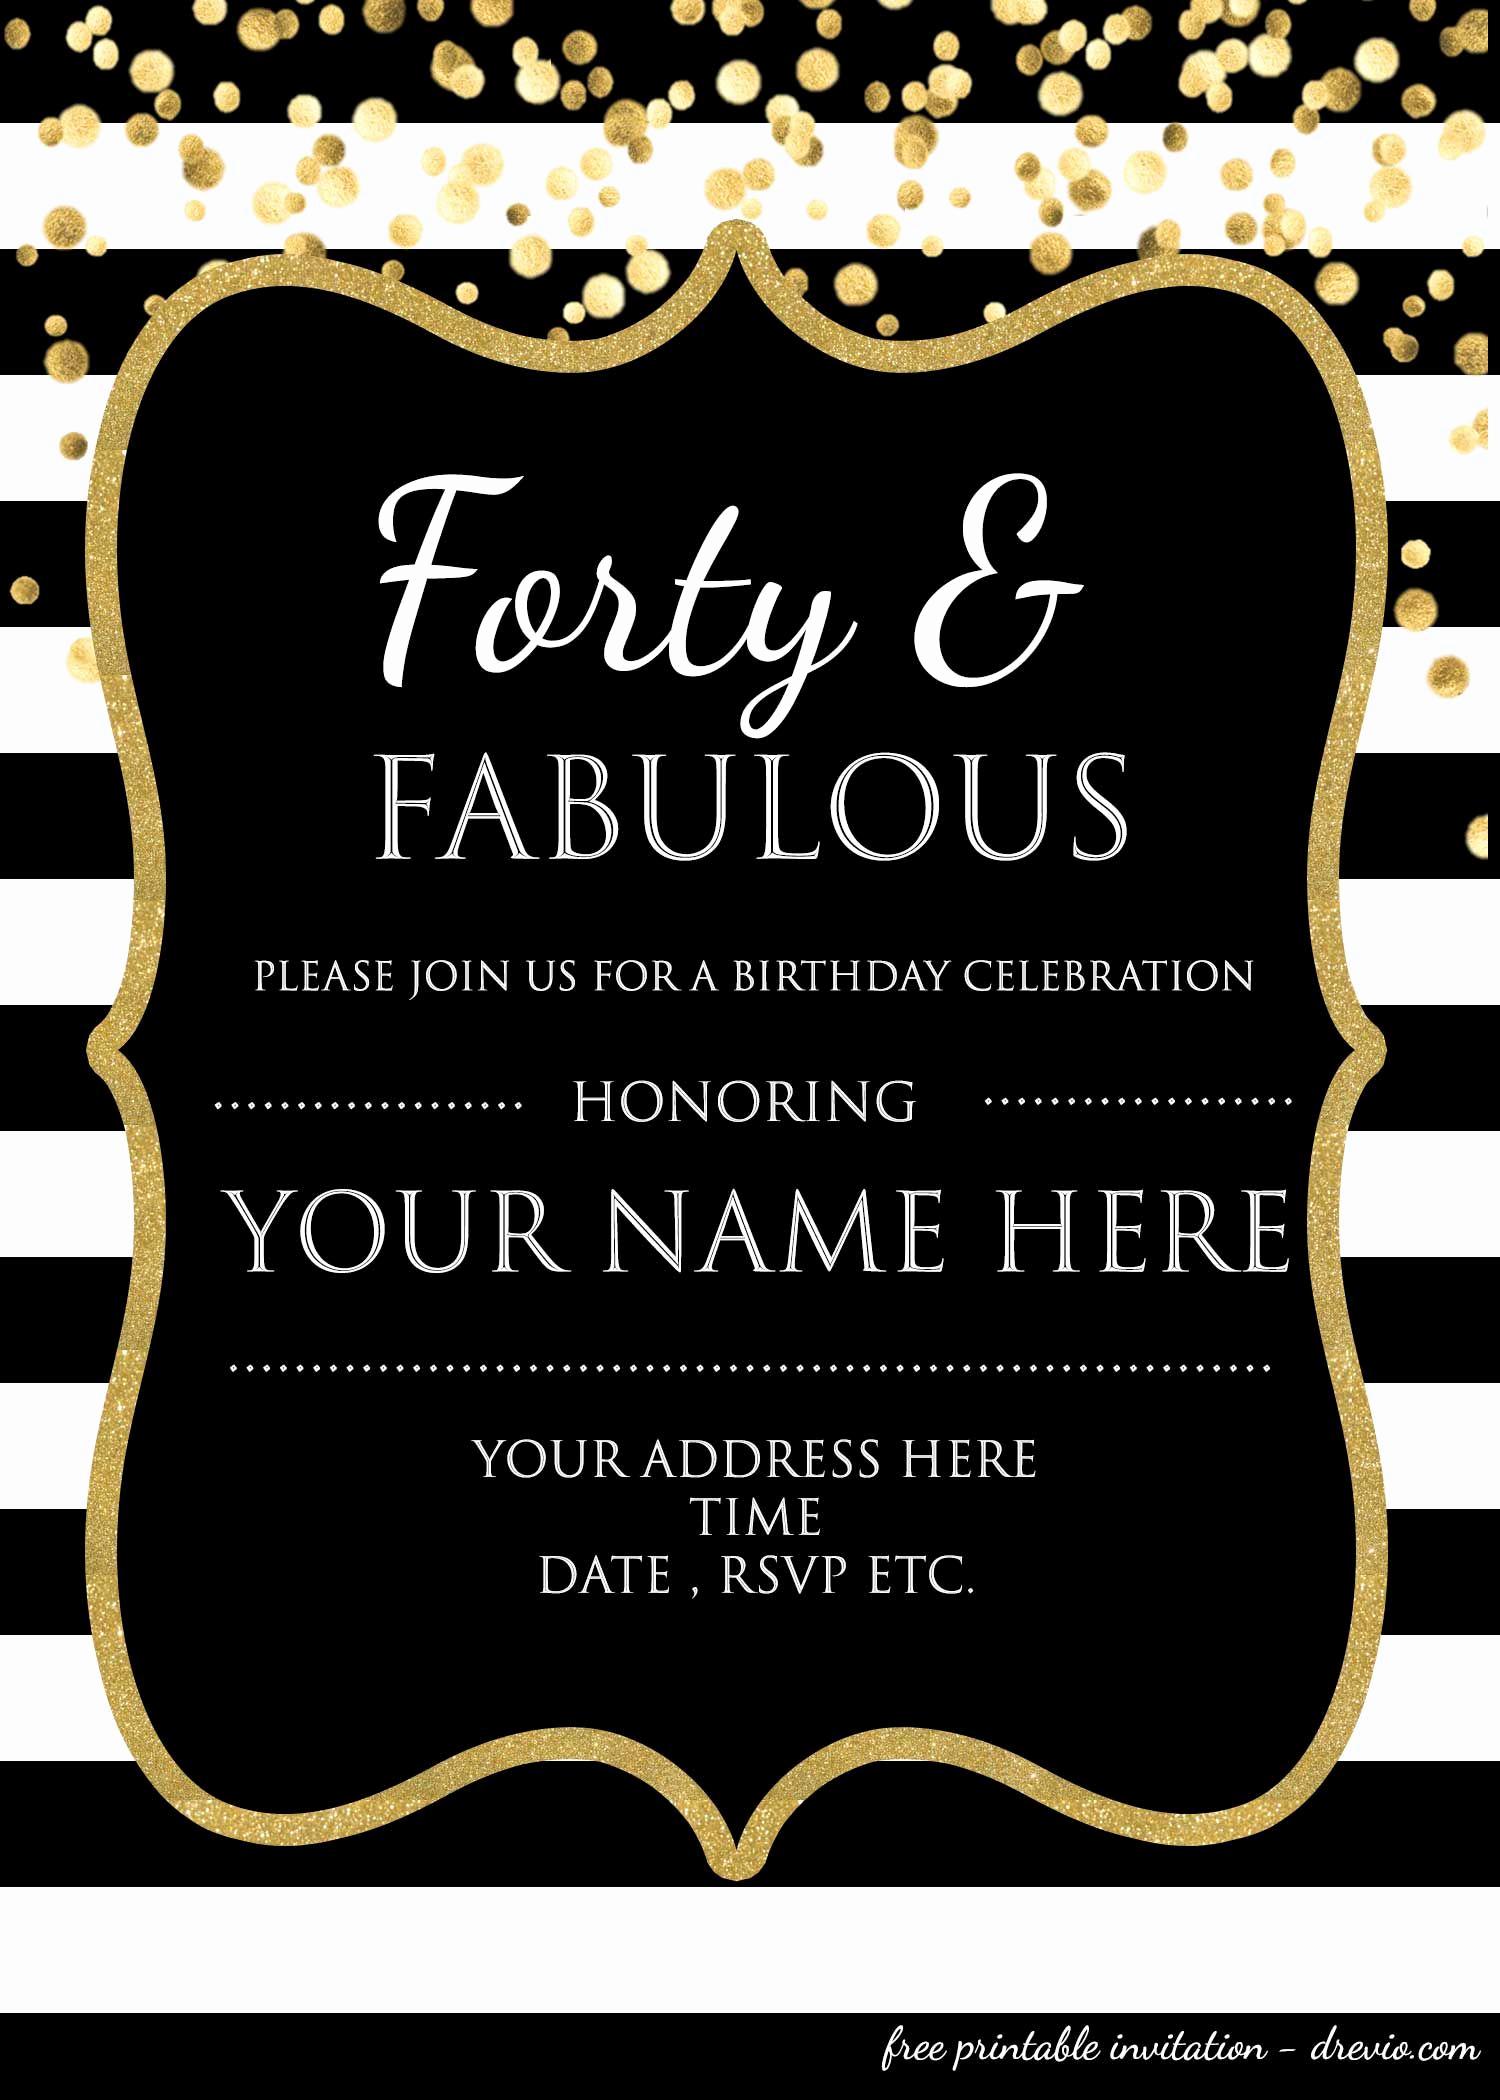 Free Birthday Invitation Templates Elegant forty & Fabulous 40th Birthday Invitation Template Psd